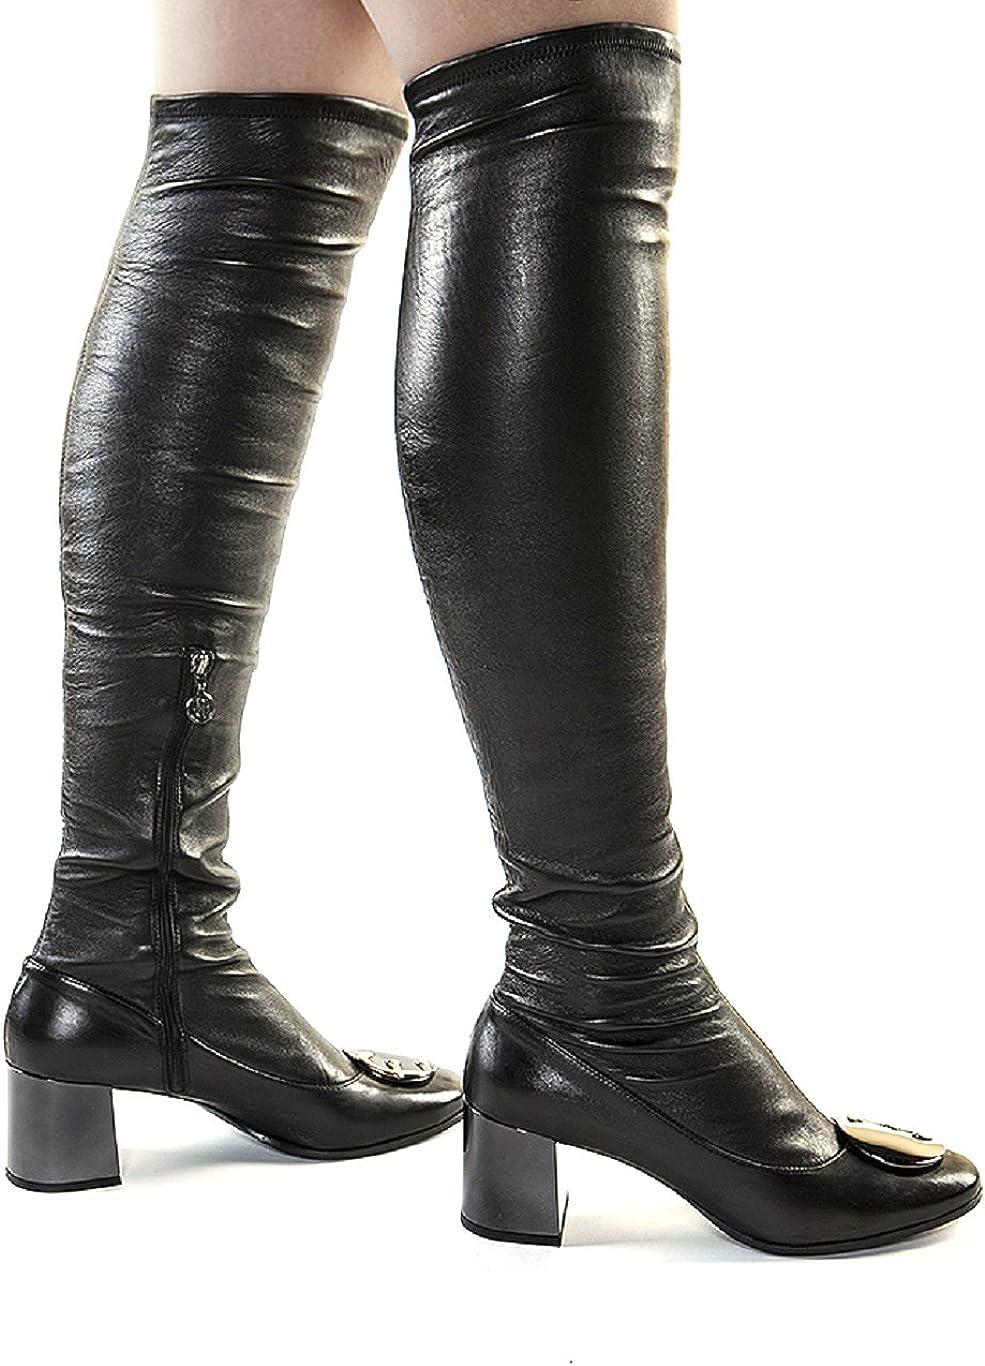 designer thigh boots